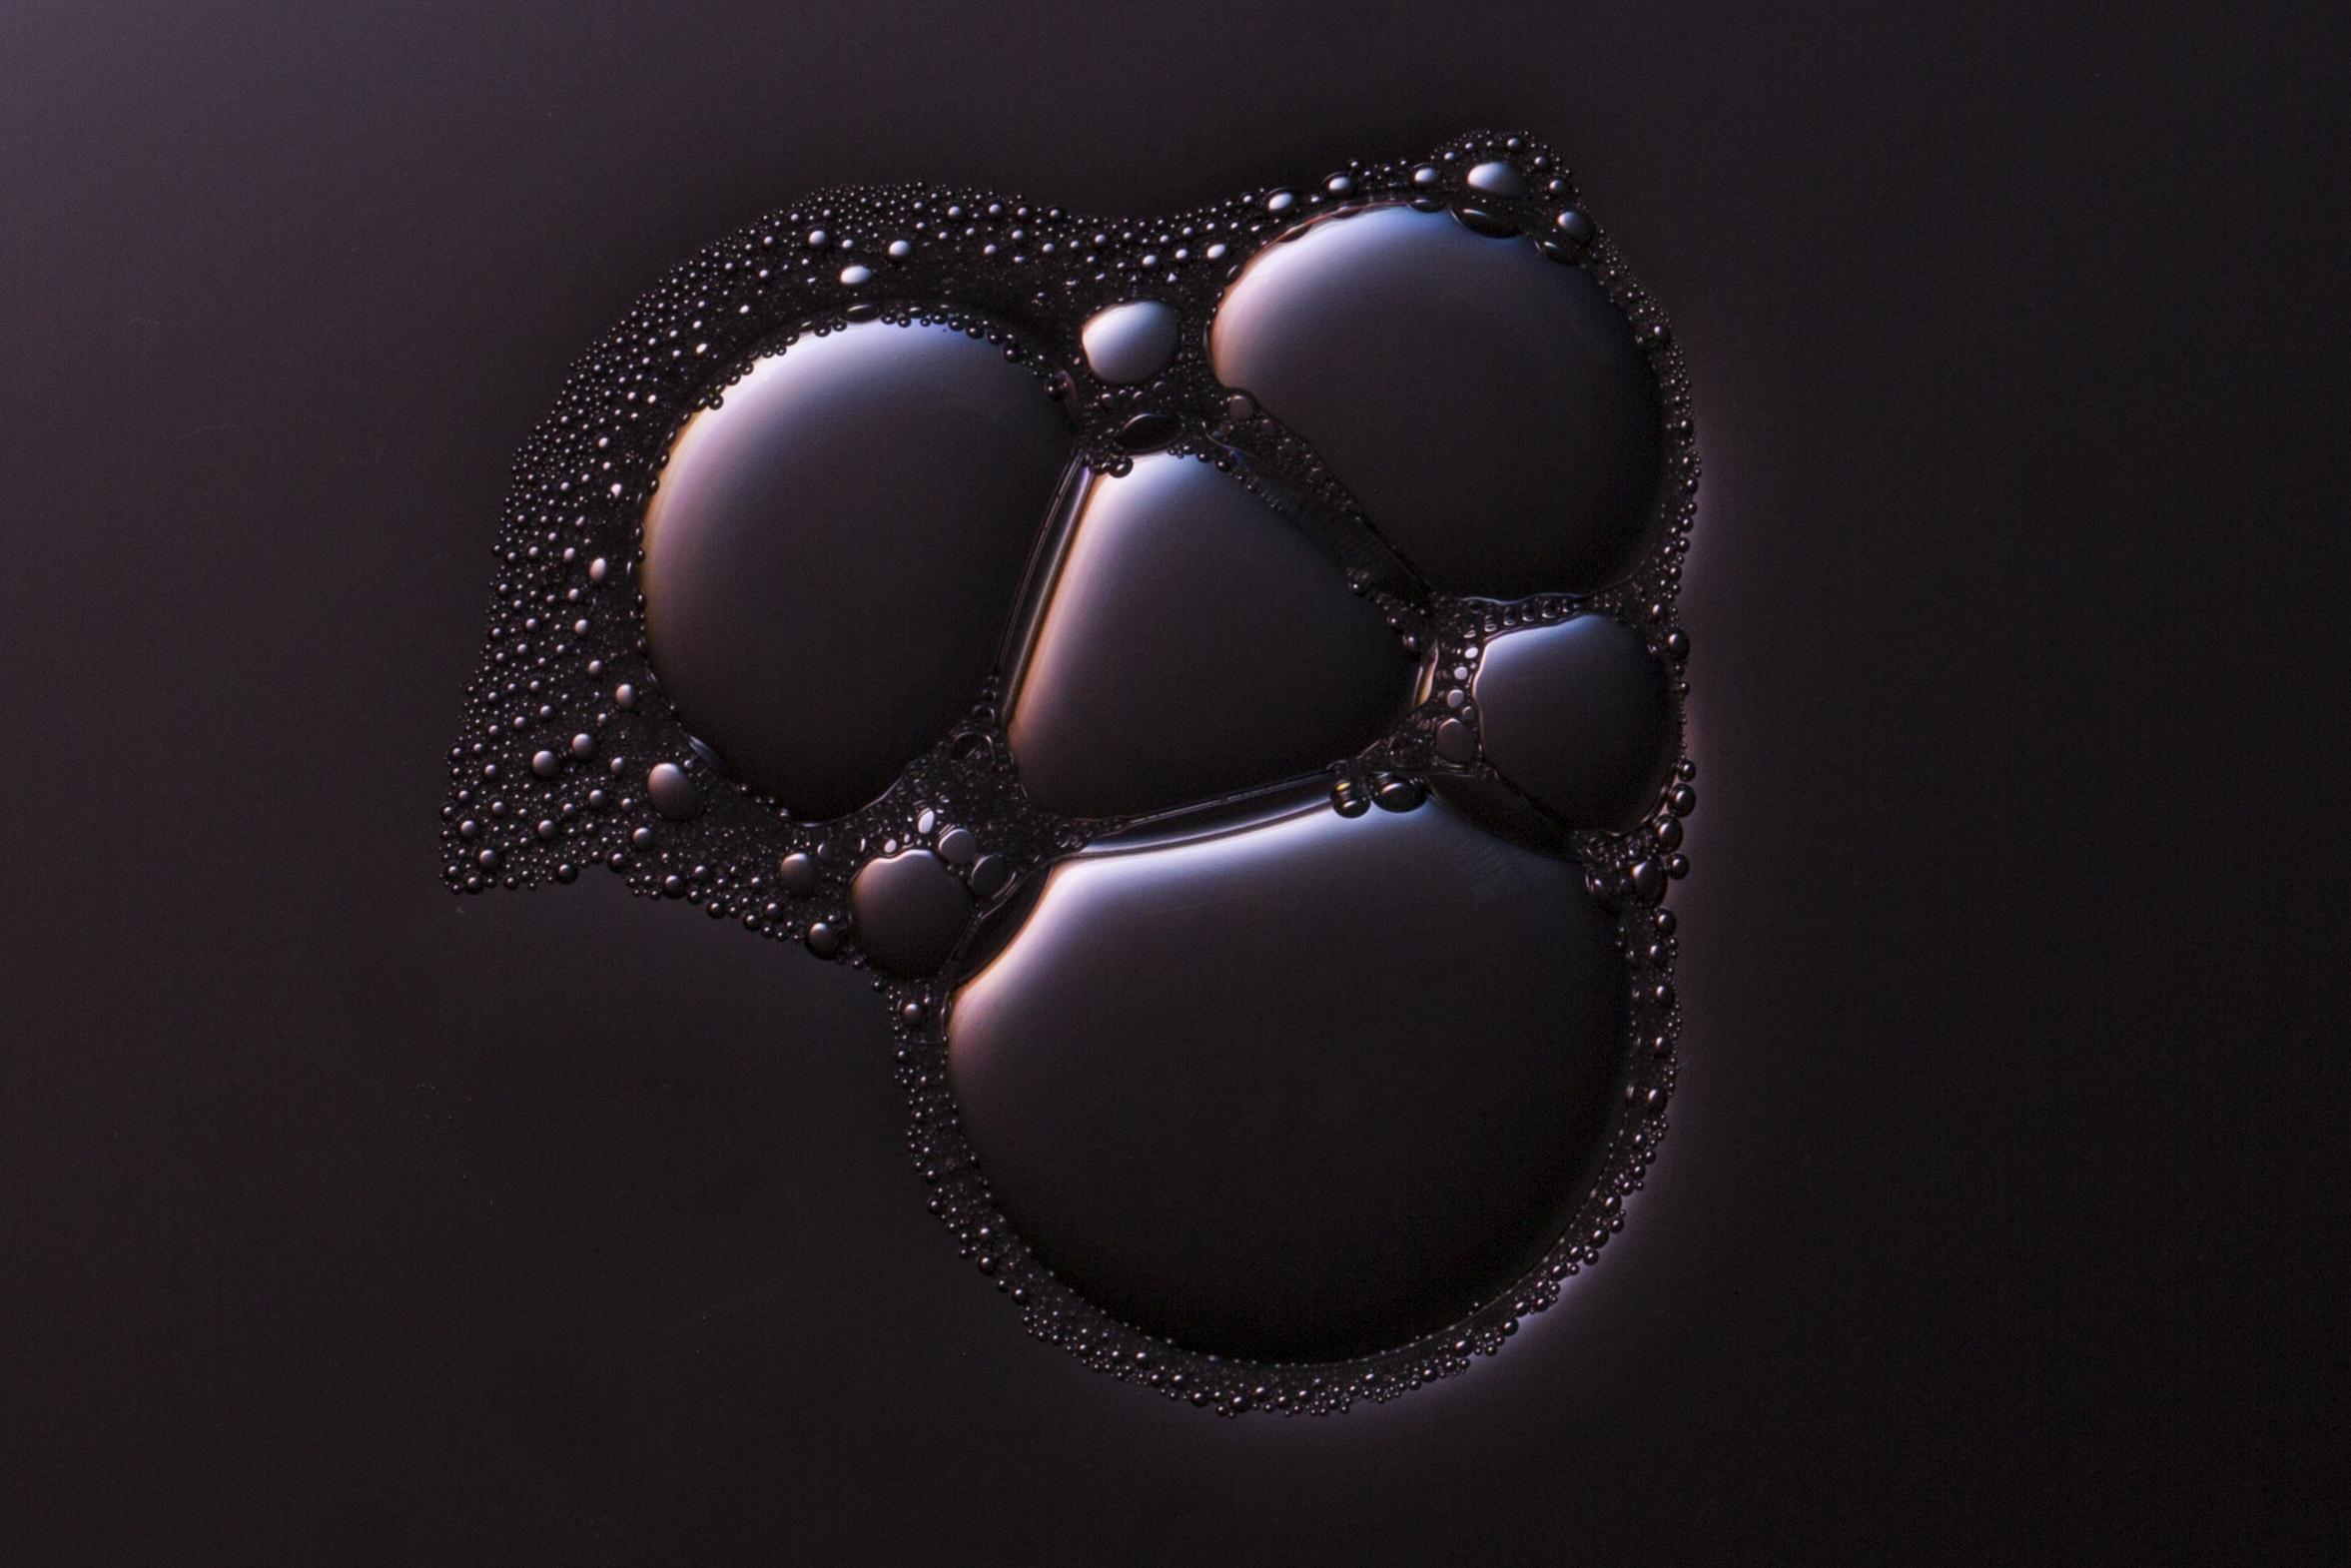 bubblechugi (634 of 1) copy.jpg